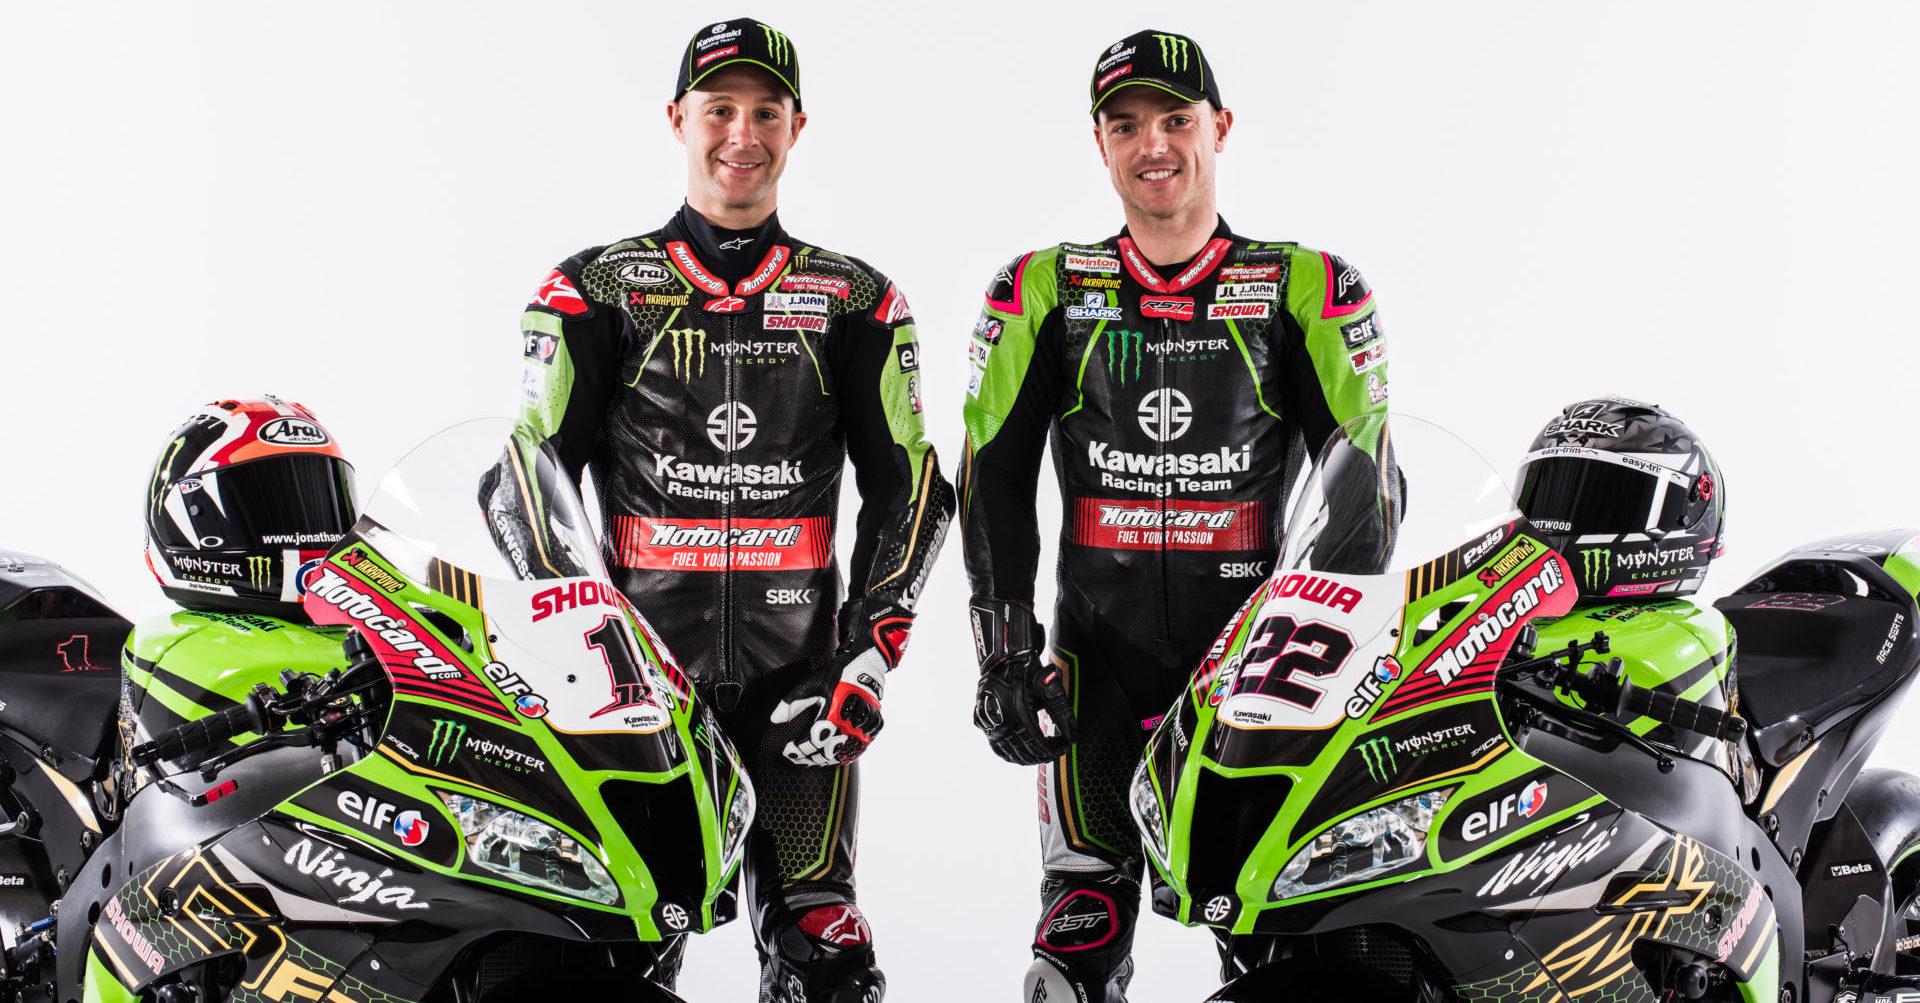 Jonathan Rea (left) and Alex Lowes (right). Photo courtesy of Kawasaki.